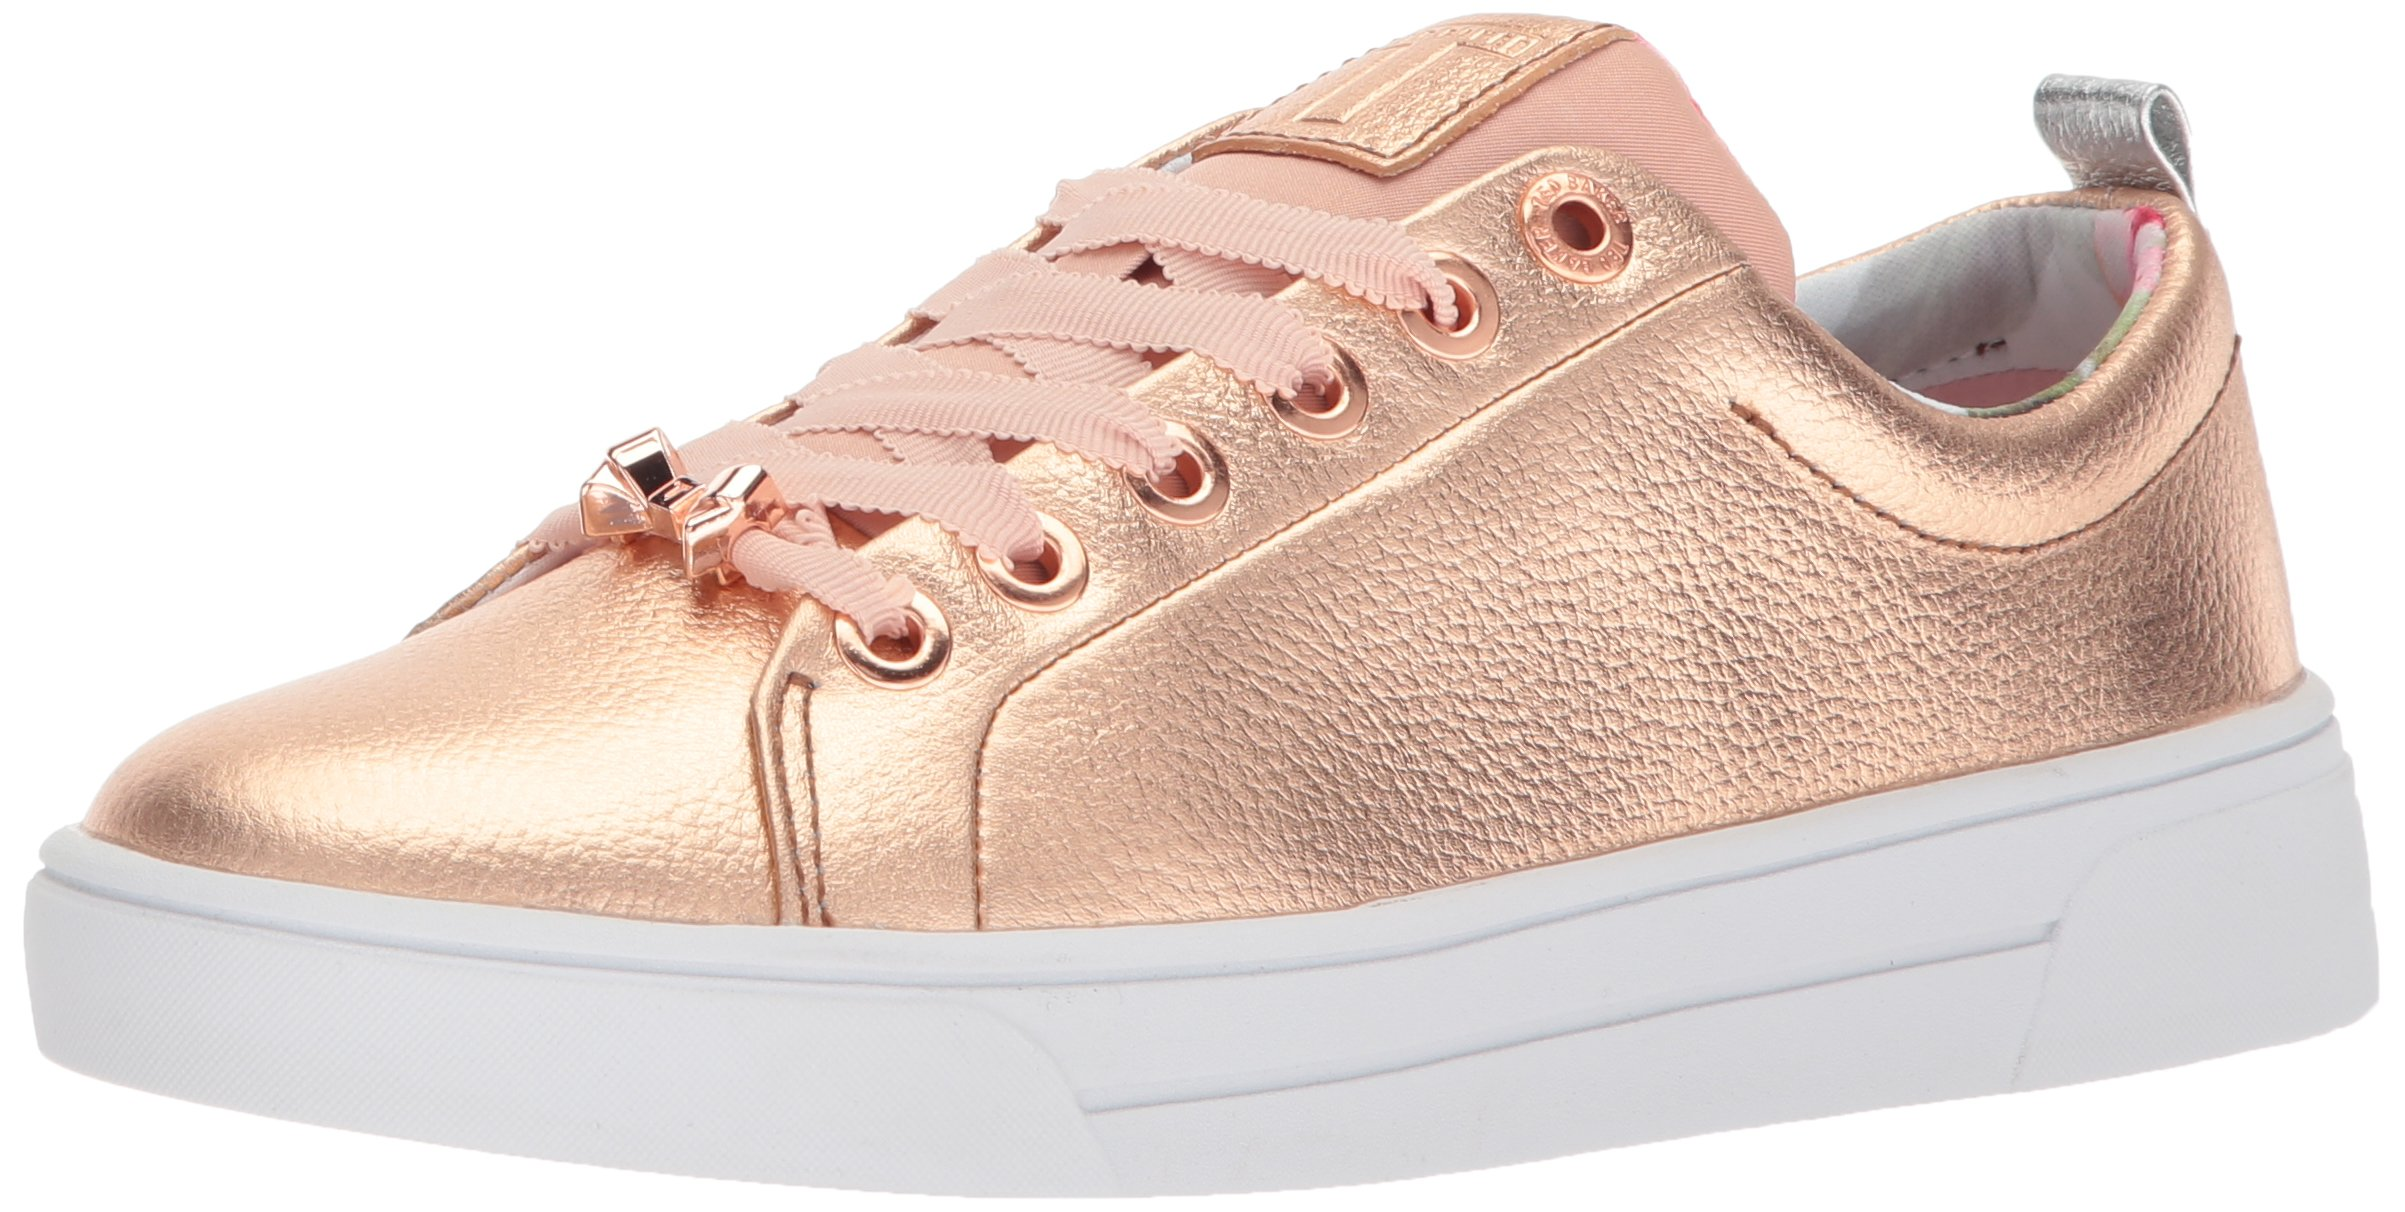 Ted Baker Women's Kellei Sneaker, Rose Gold, 7 B(M) US